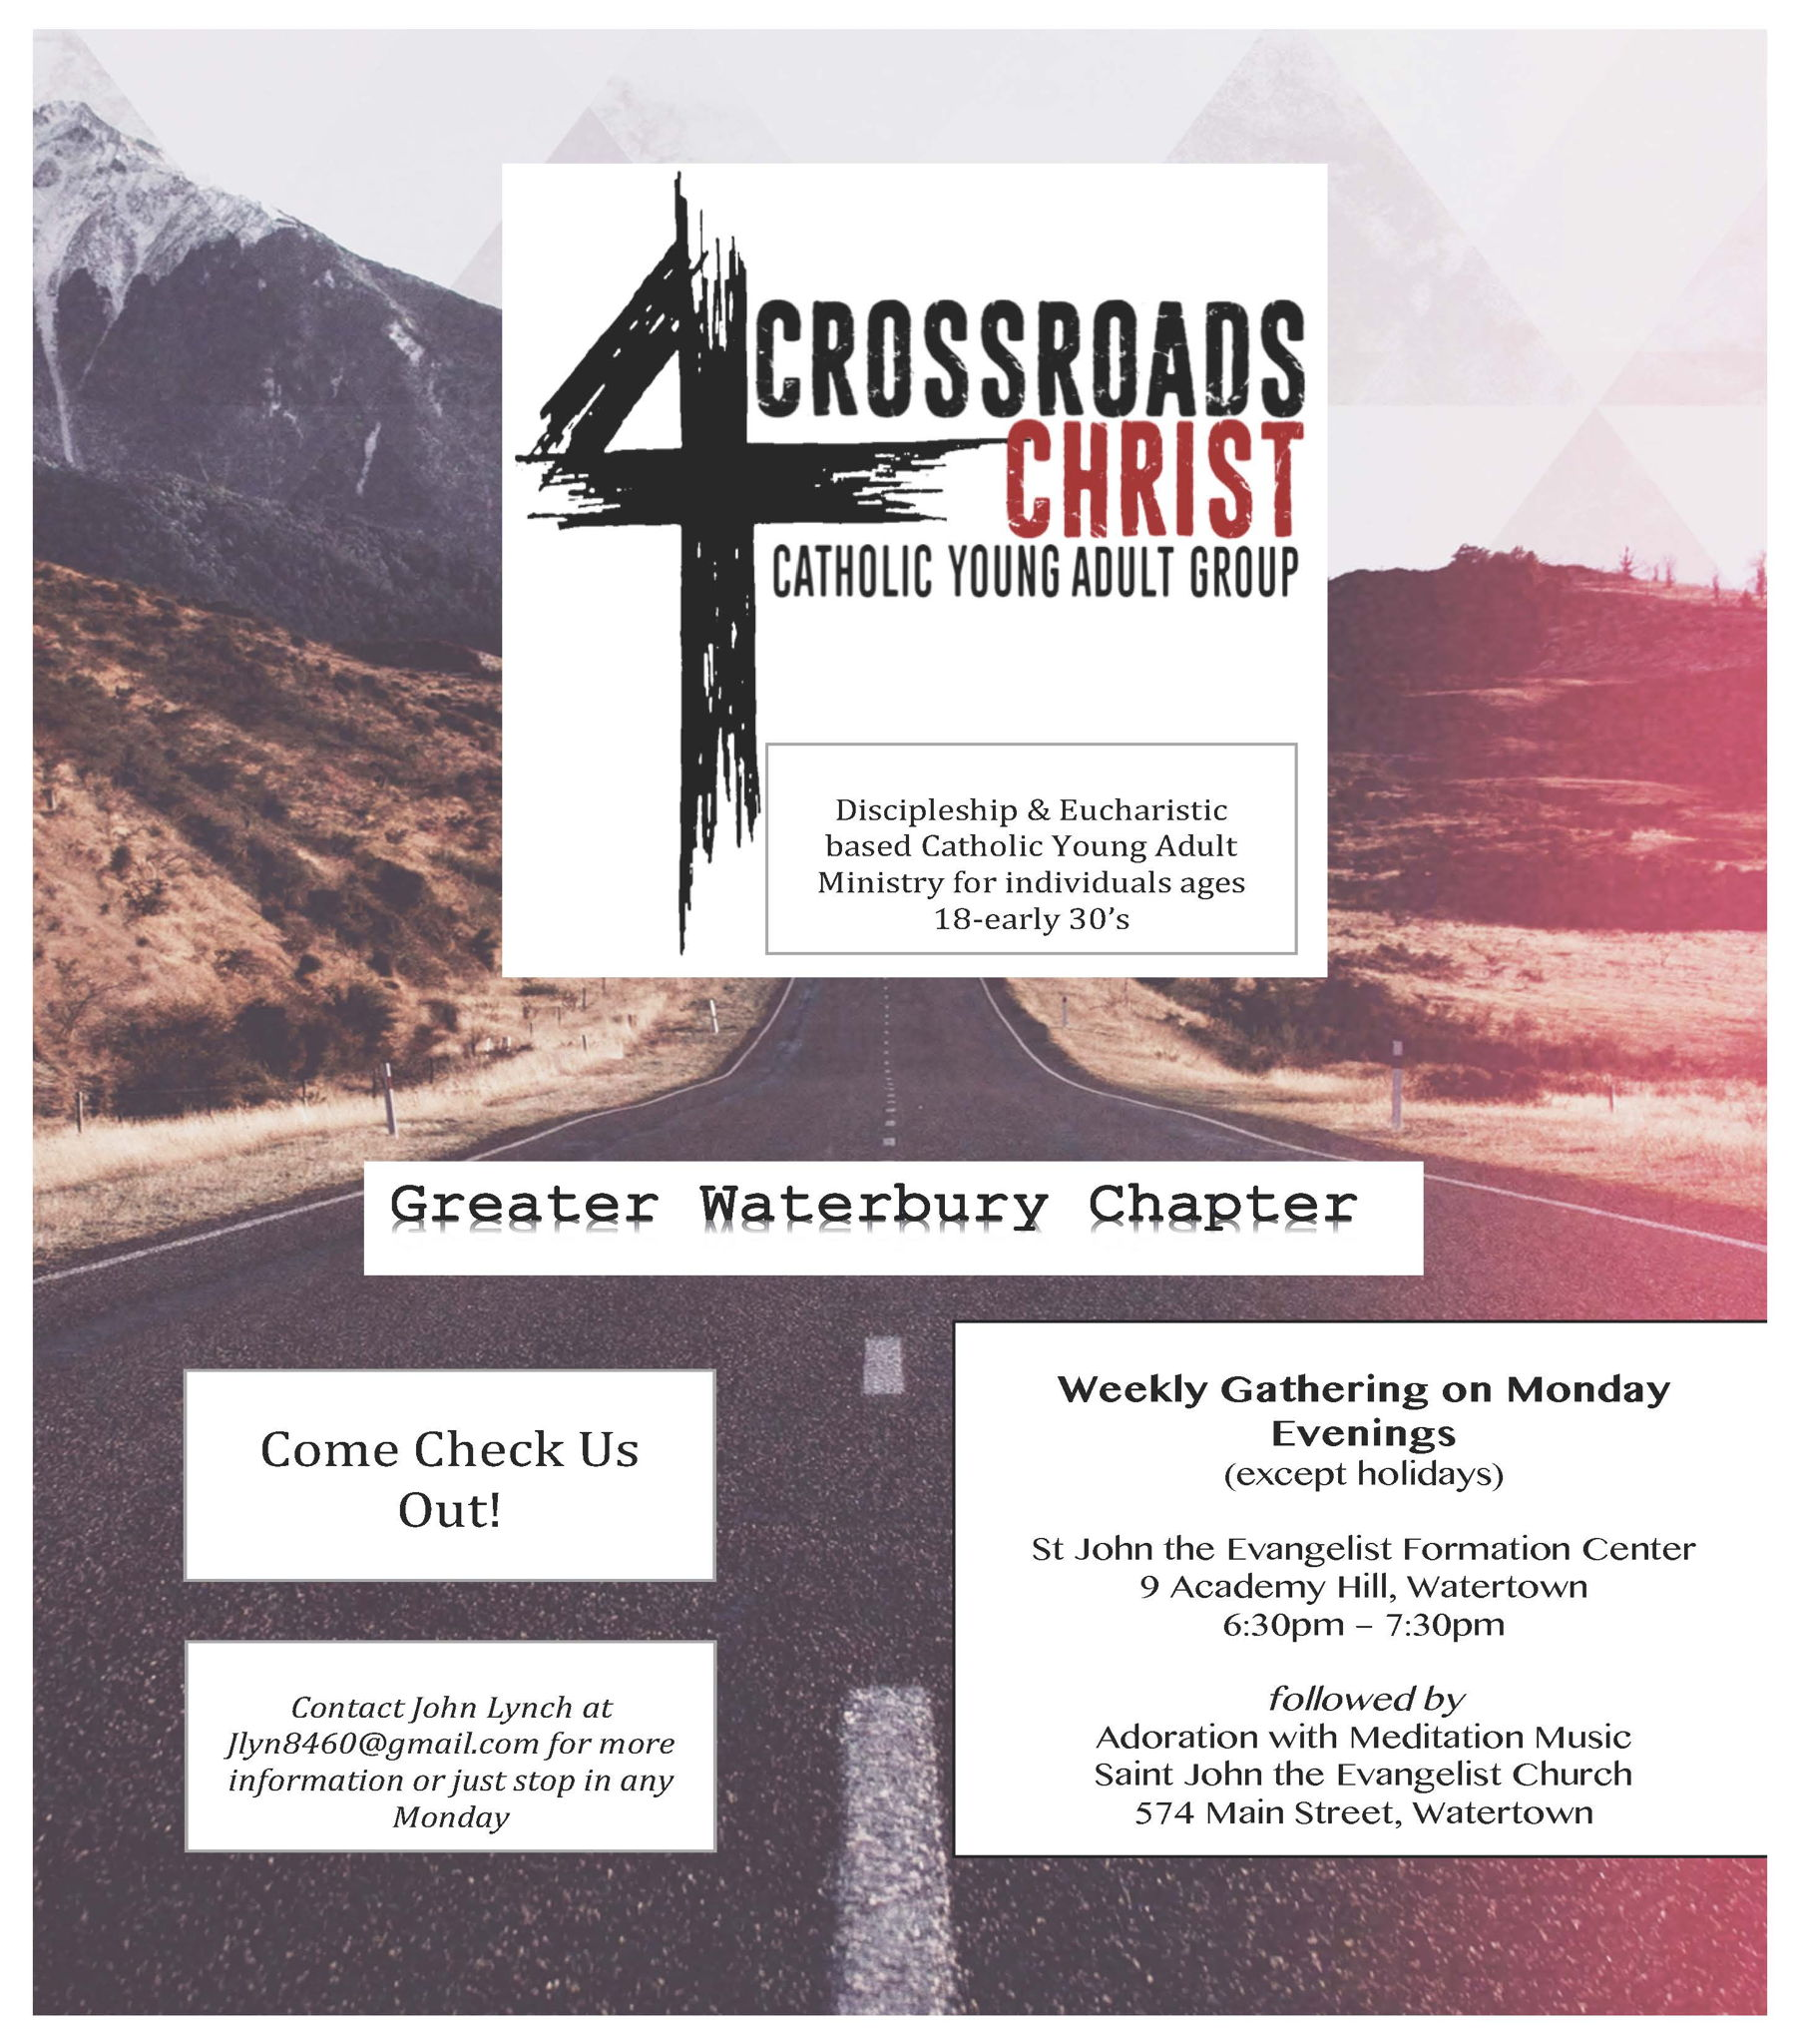 C4CGreatwtby Flyer.jpg